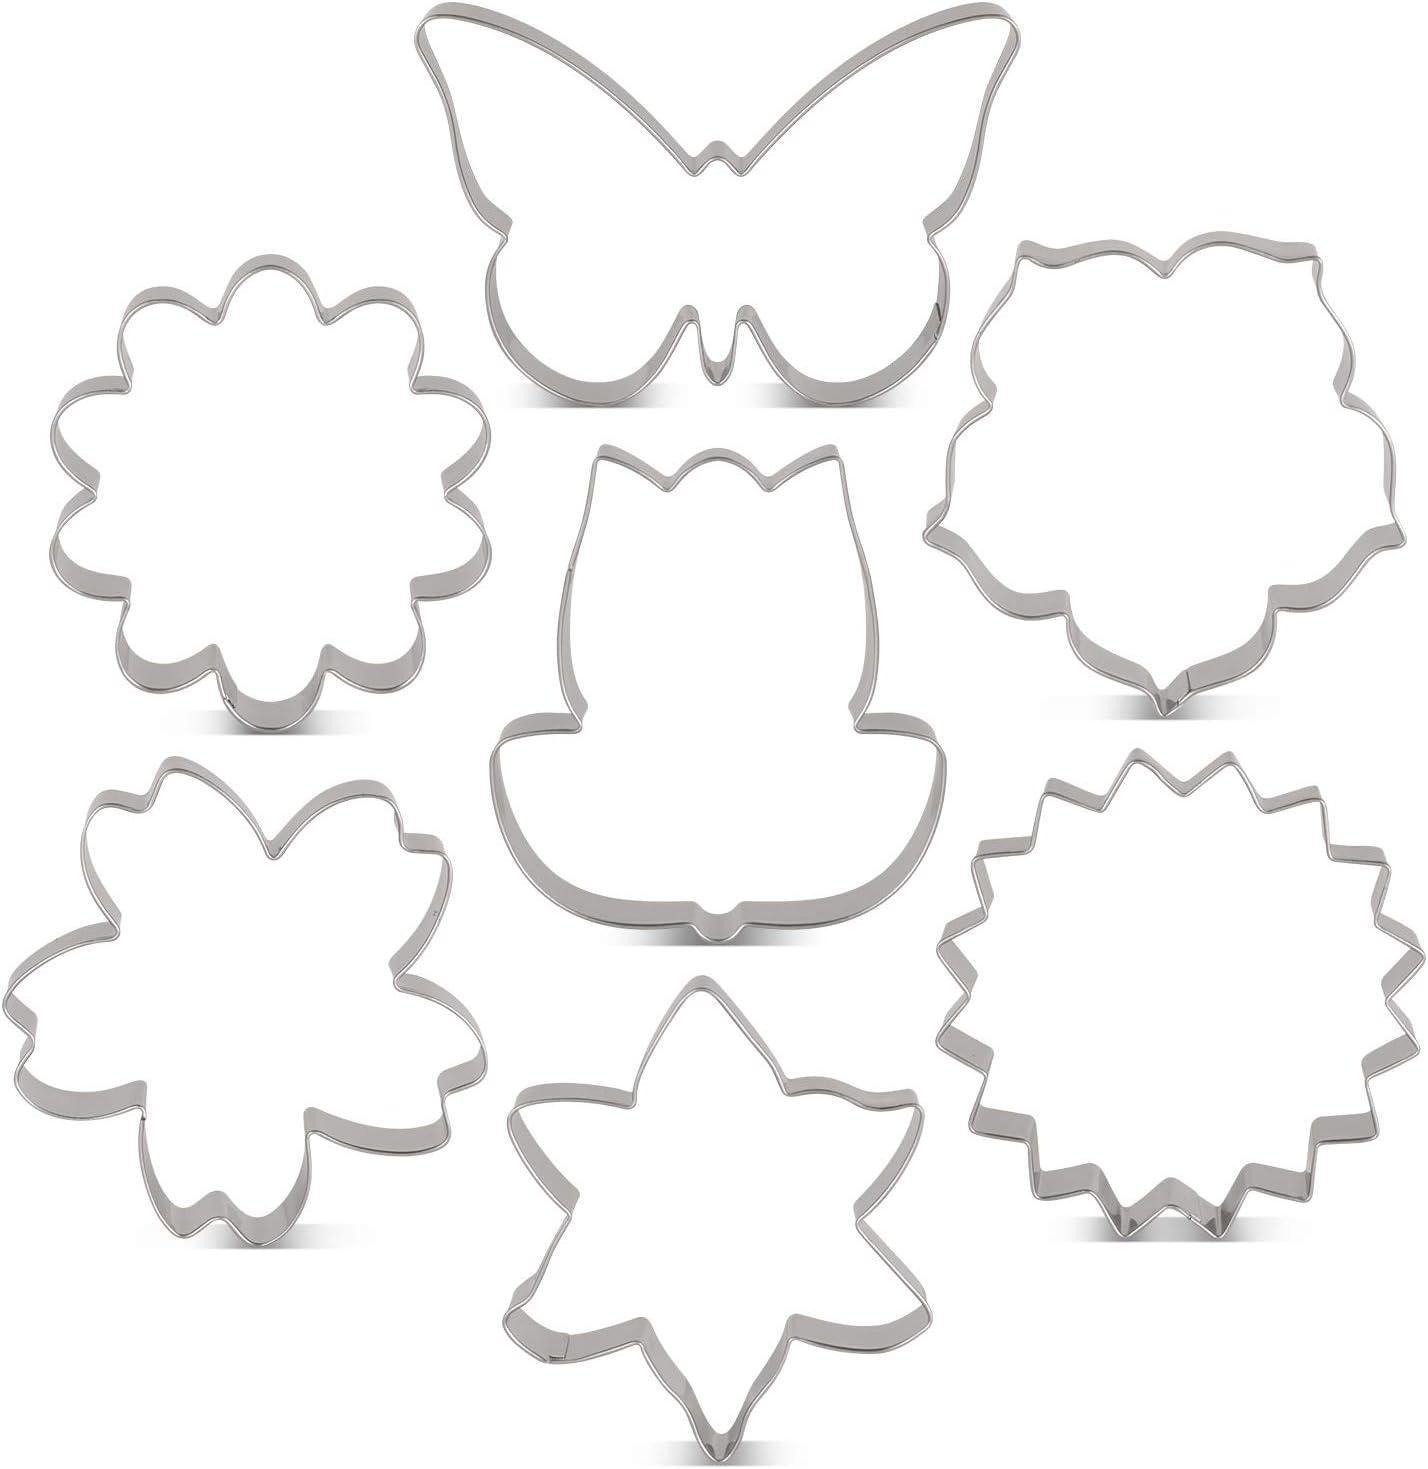 mini blossom cutters Stephanotis blossom cutters,Sugarcraft cutters,Small calyx cutter,Jasmin flower cutter,sugarcraft tools,Clay cutters